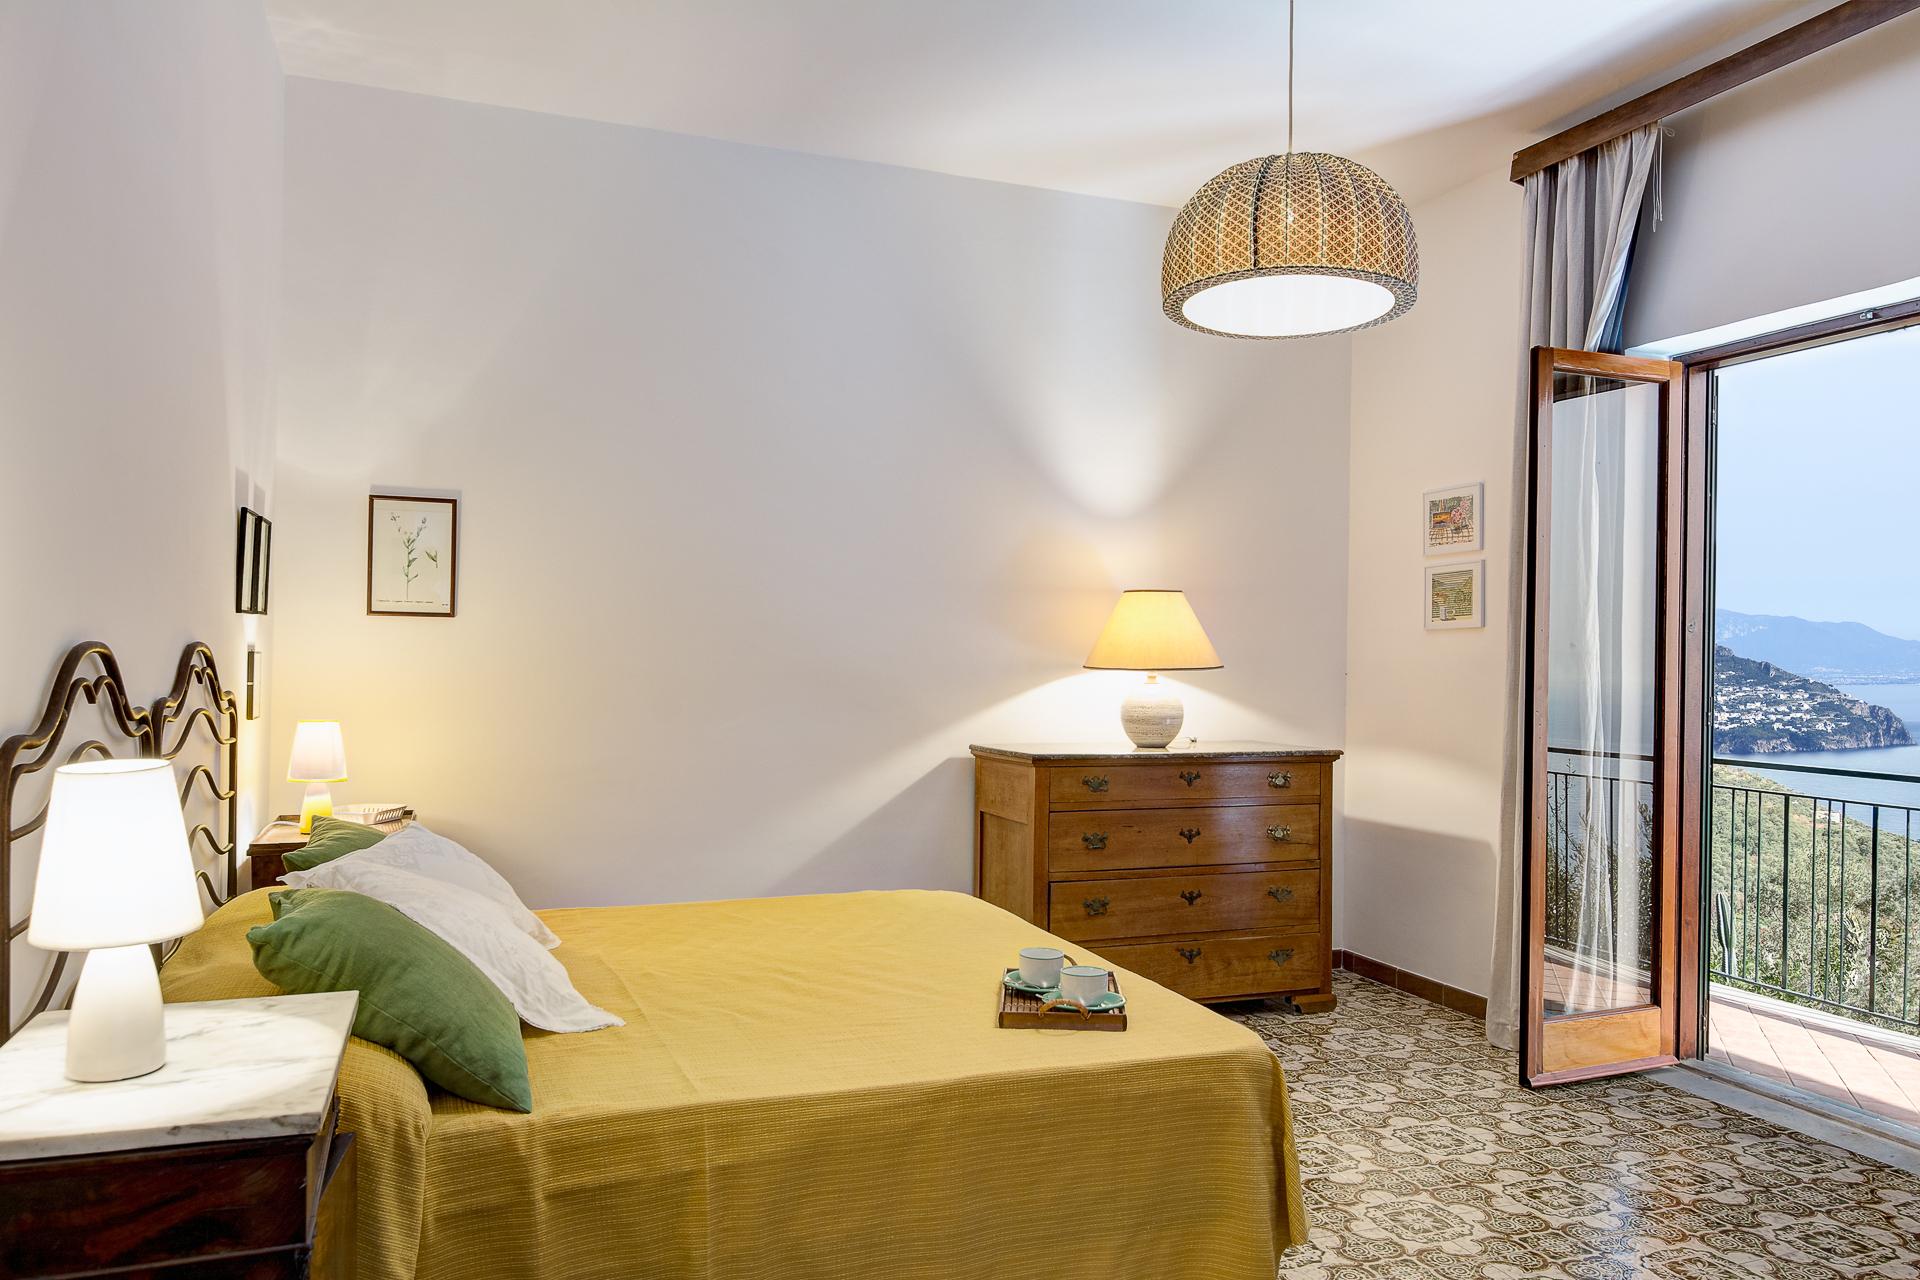 Apartment Casa Elisa - Spectaular Views to the Amalfi Coast photo 20285609